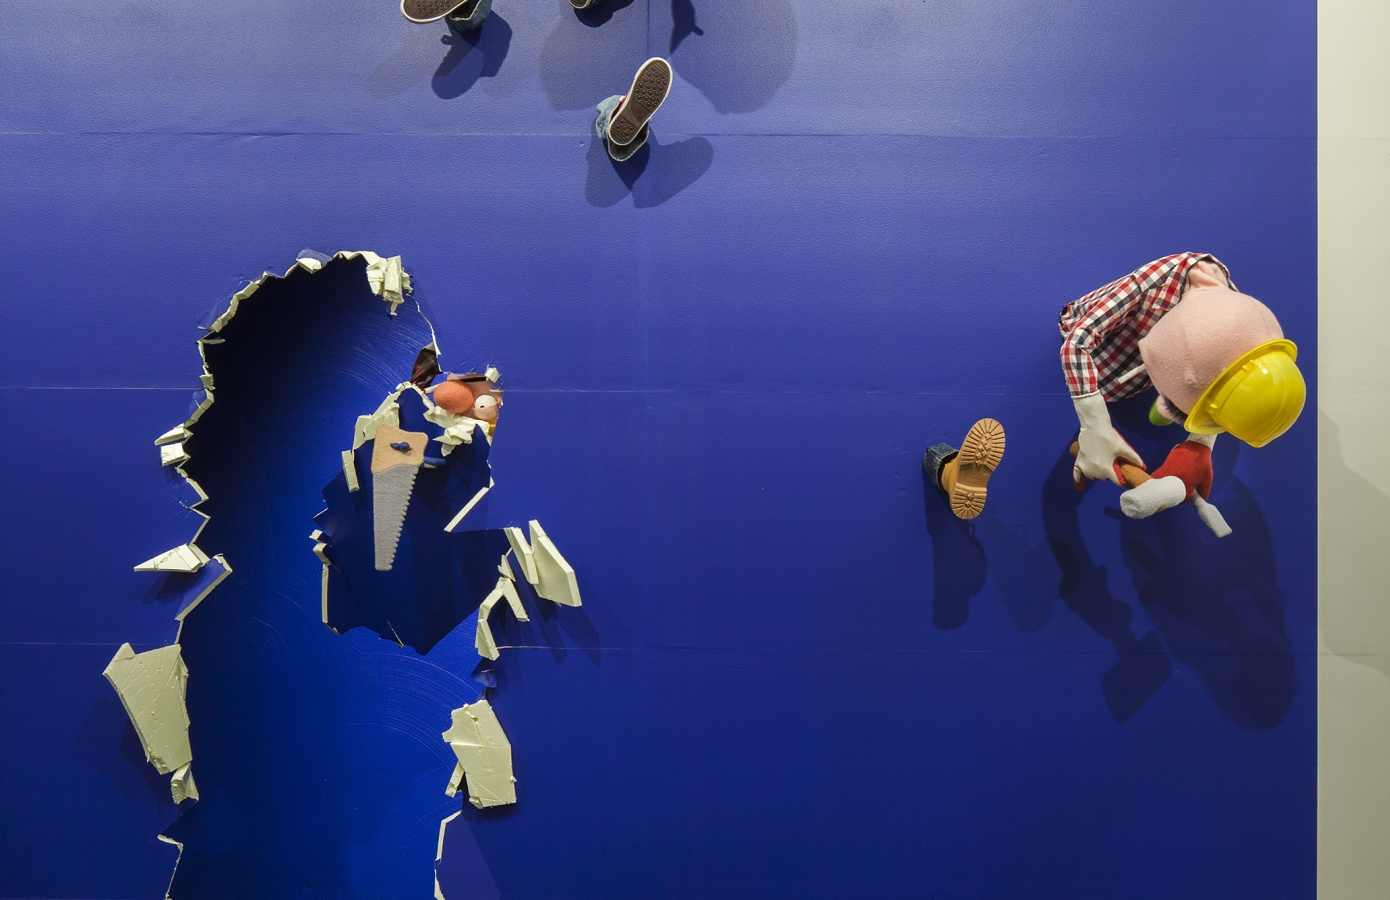 Erkka Nissinen & Nathaniel Mellor, The Alto Natives, Kiasma, Helsinki, ,